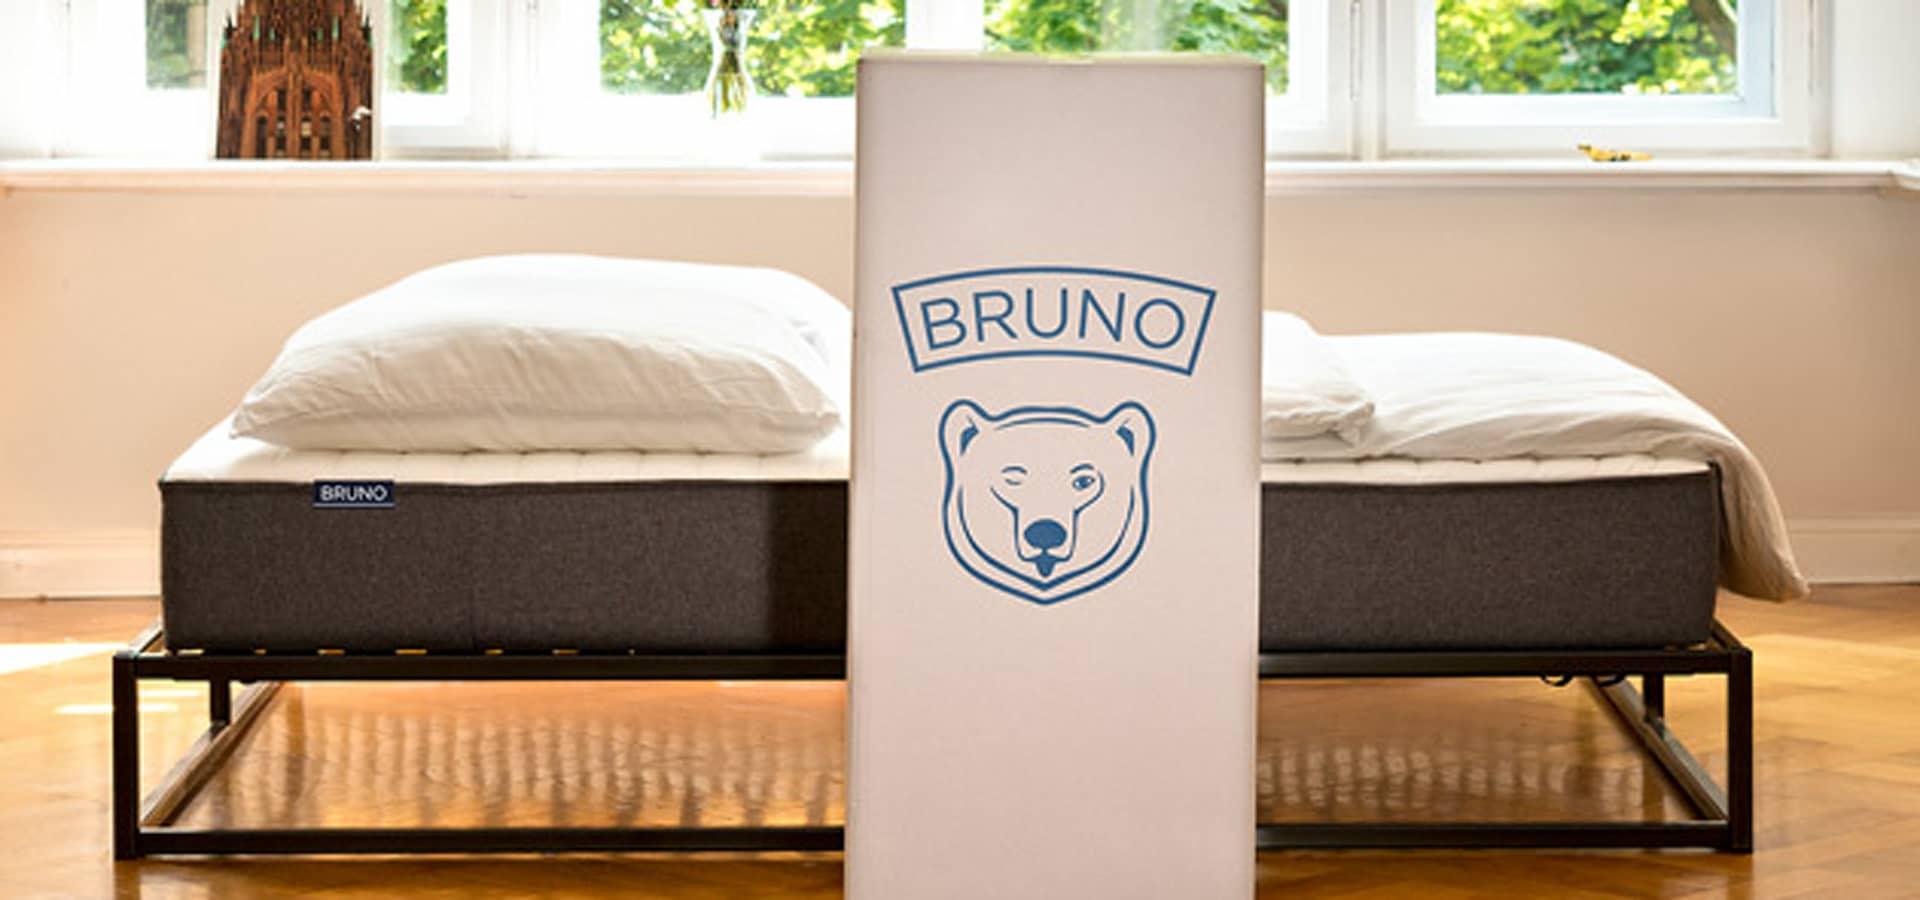 Les matelas Bruno